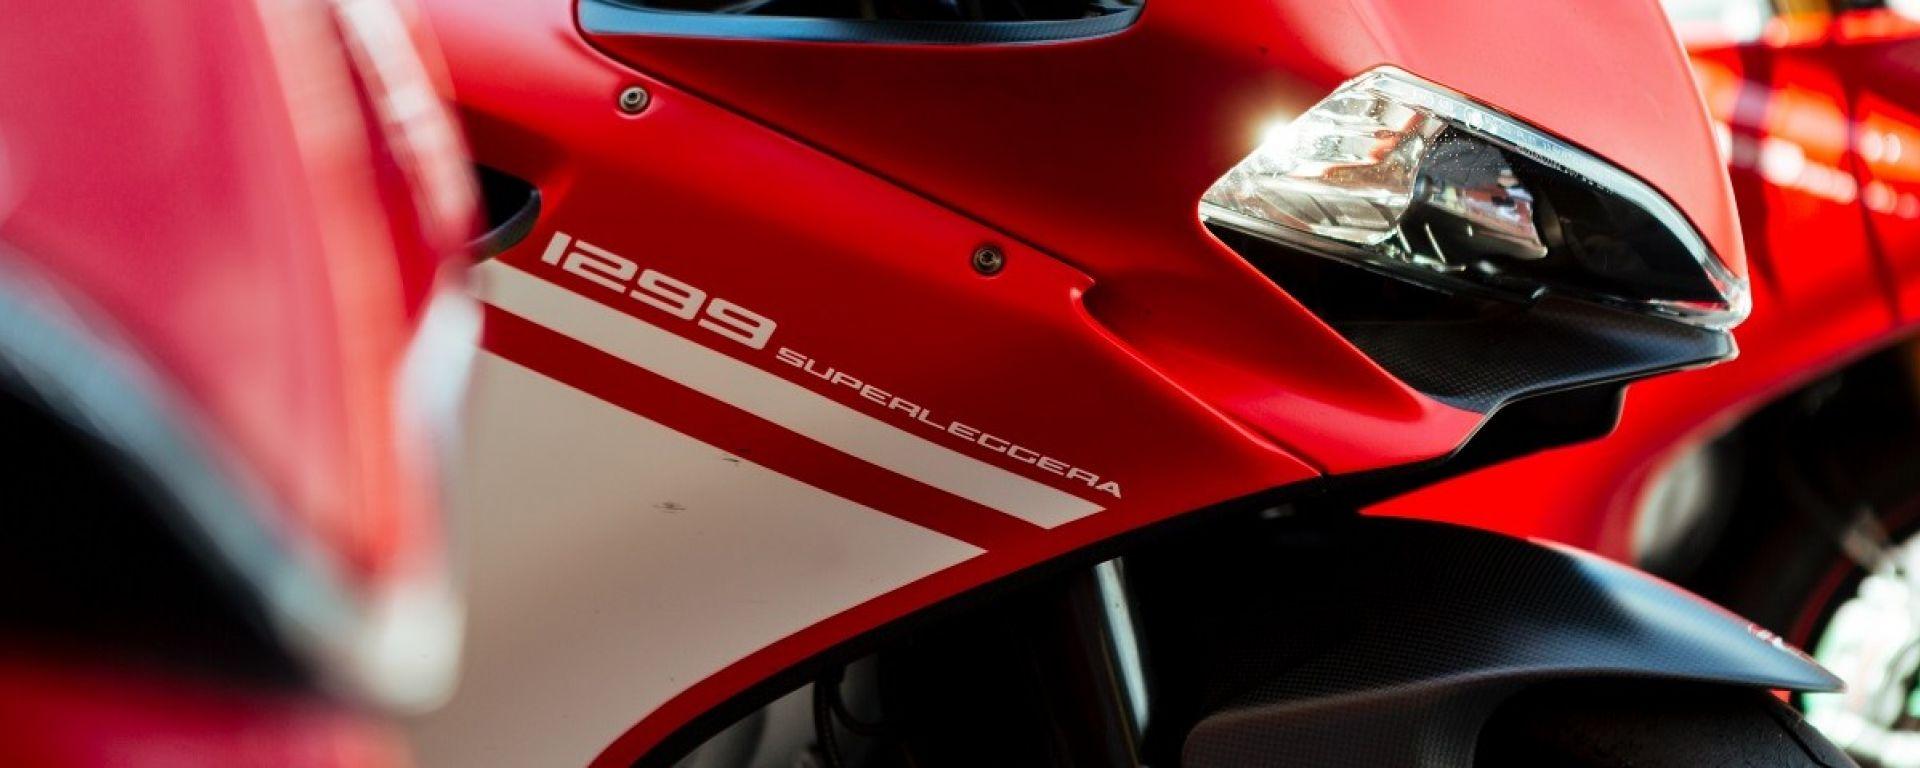 Ducati Superleggera Superbike Experience